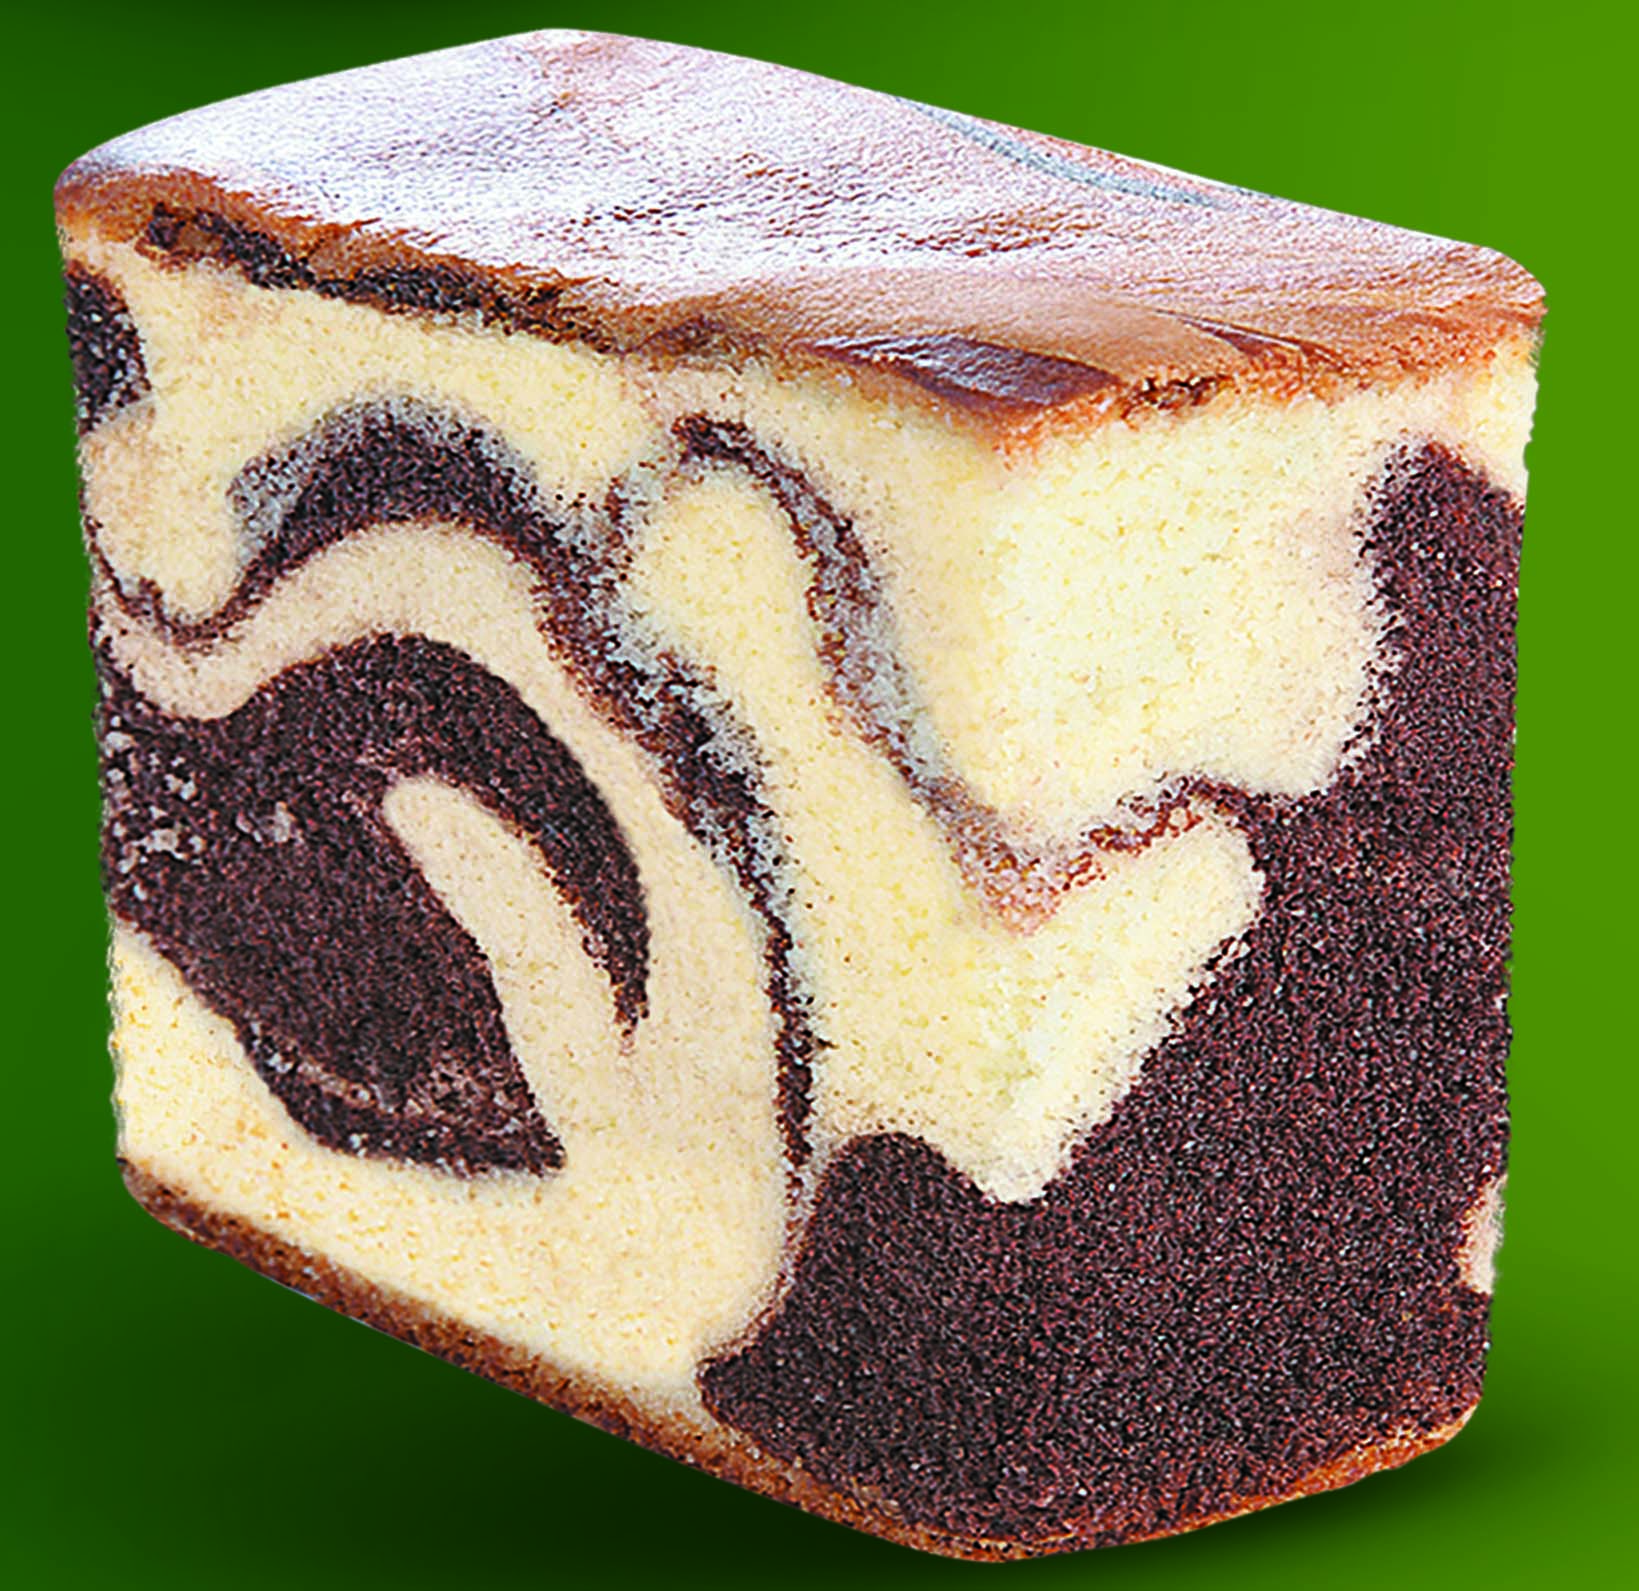 Heavenly Marble Cake Slice